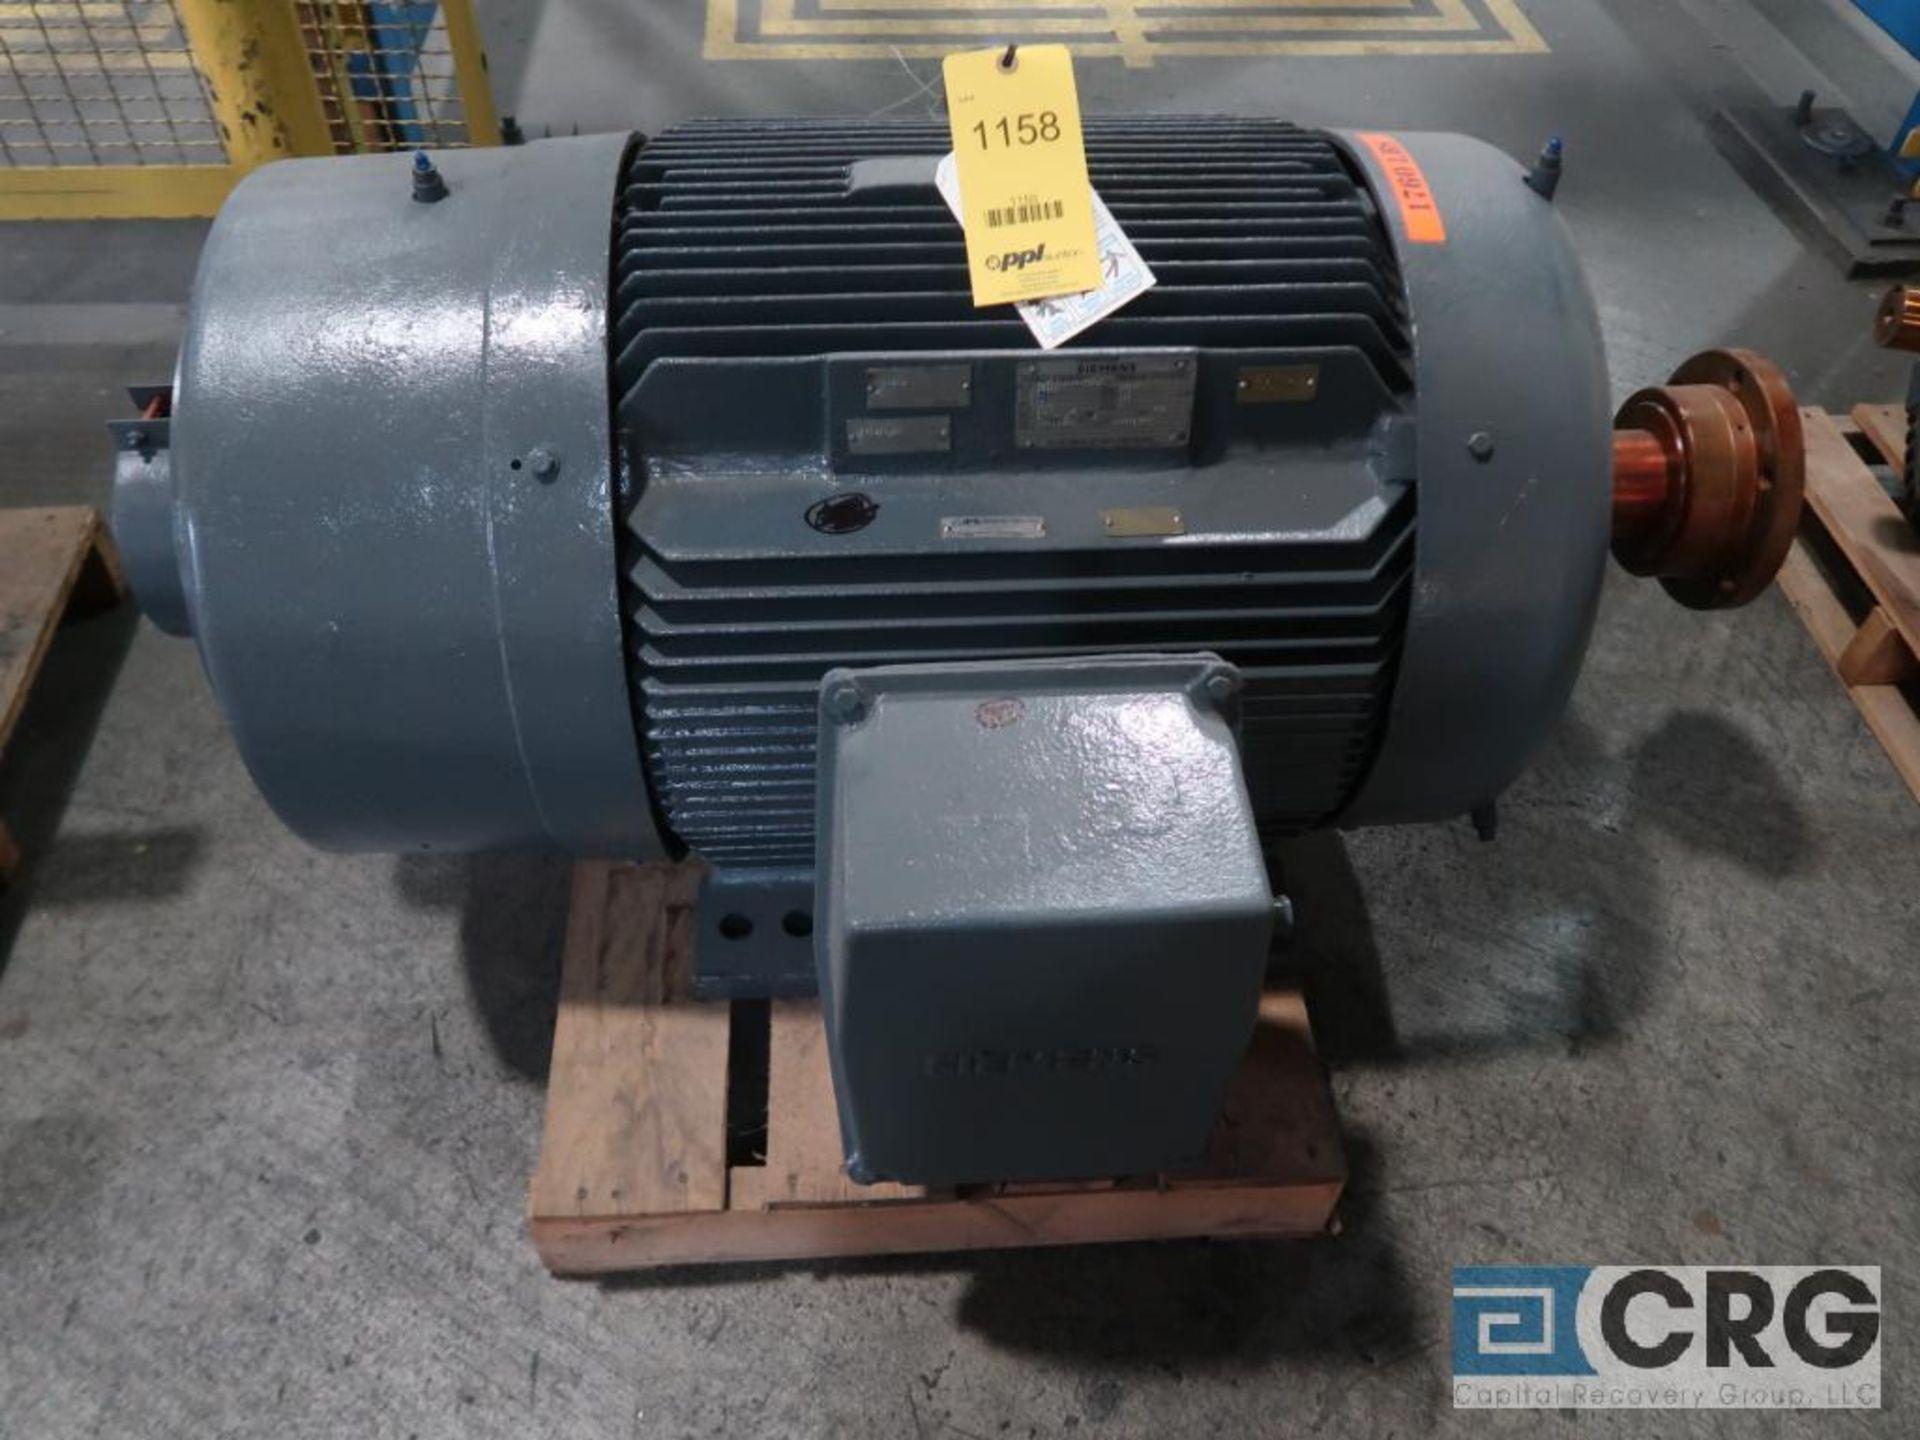 Siemens Energy Express motor, 125 HP, 1,785 RPMs, 460 volt, 3 ph., 445TZ frame (Finish Building)